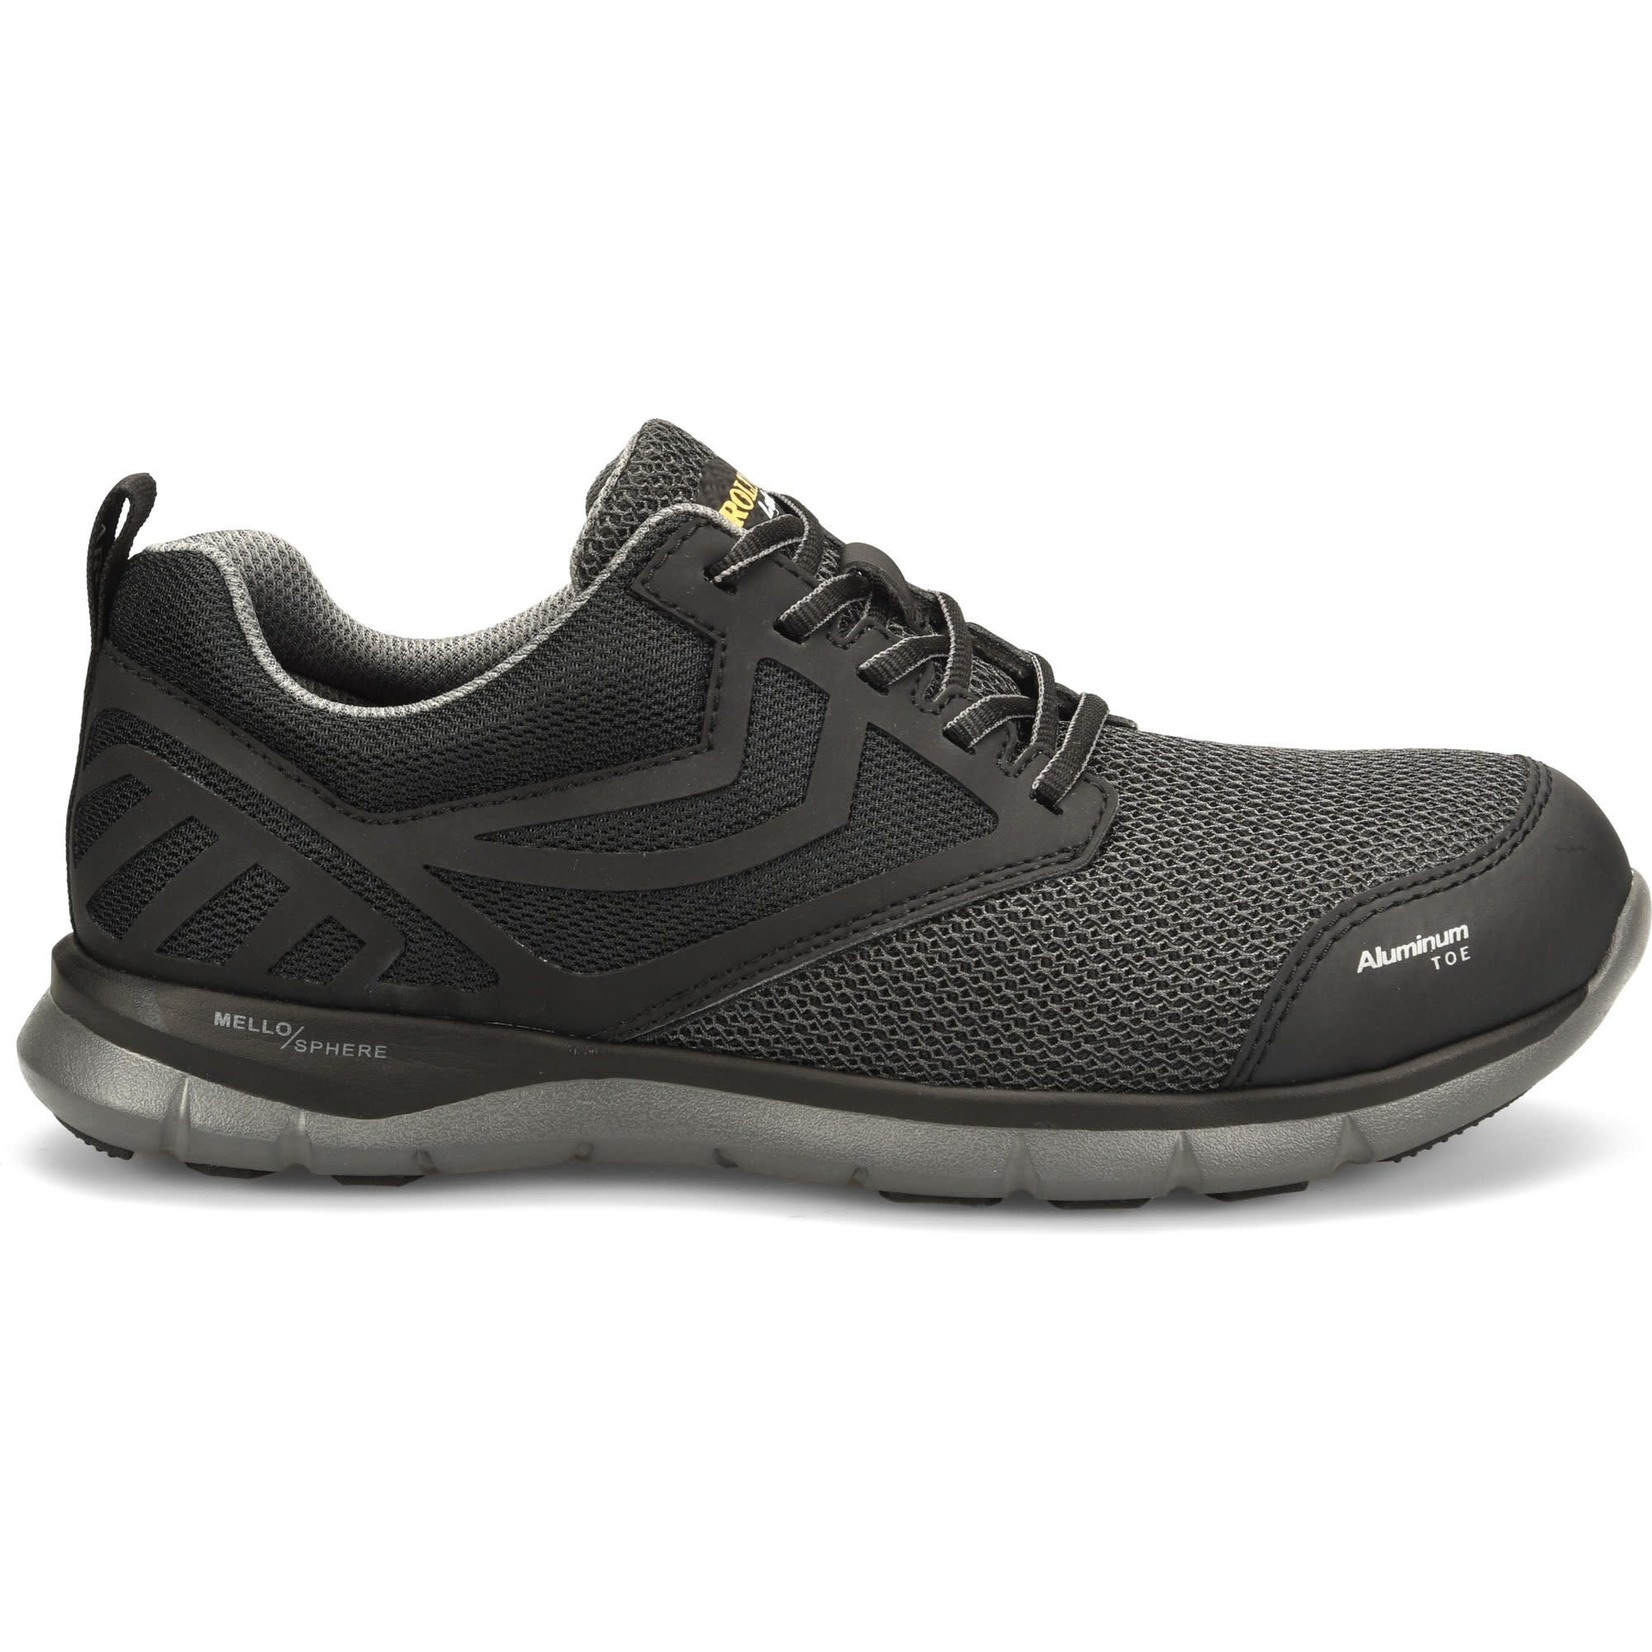 Carolina Men's Carolins Shoe Aluminum Toe  GUST LO CA1902